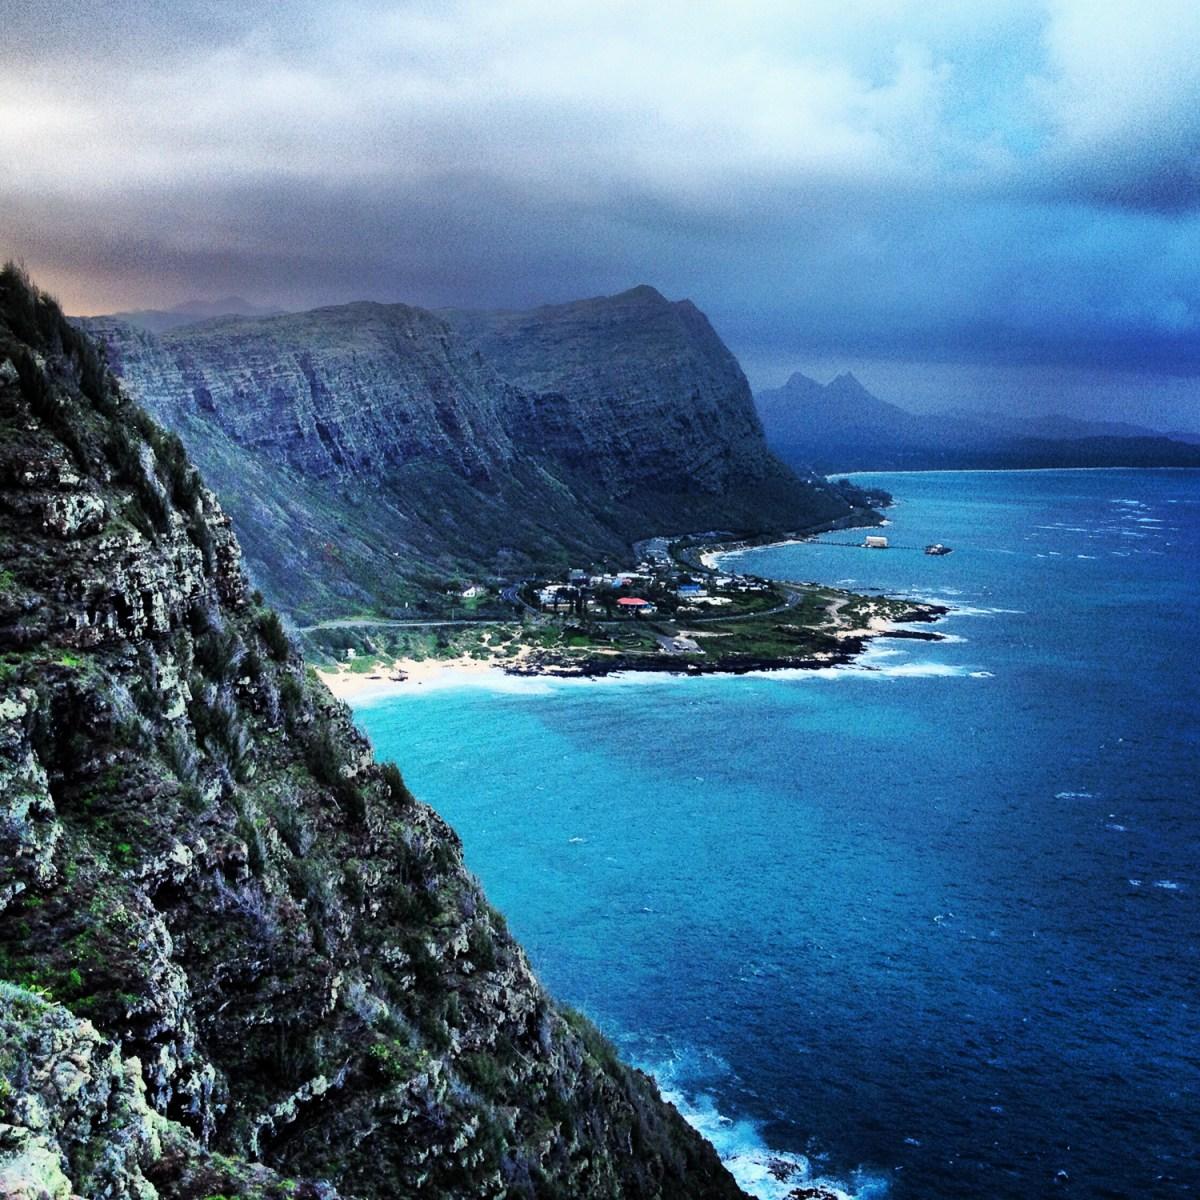 Travel: Take a Trip to the Island Paradise of Hawaii